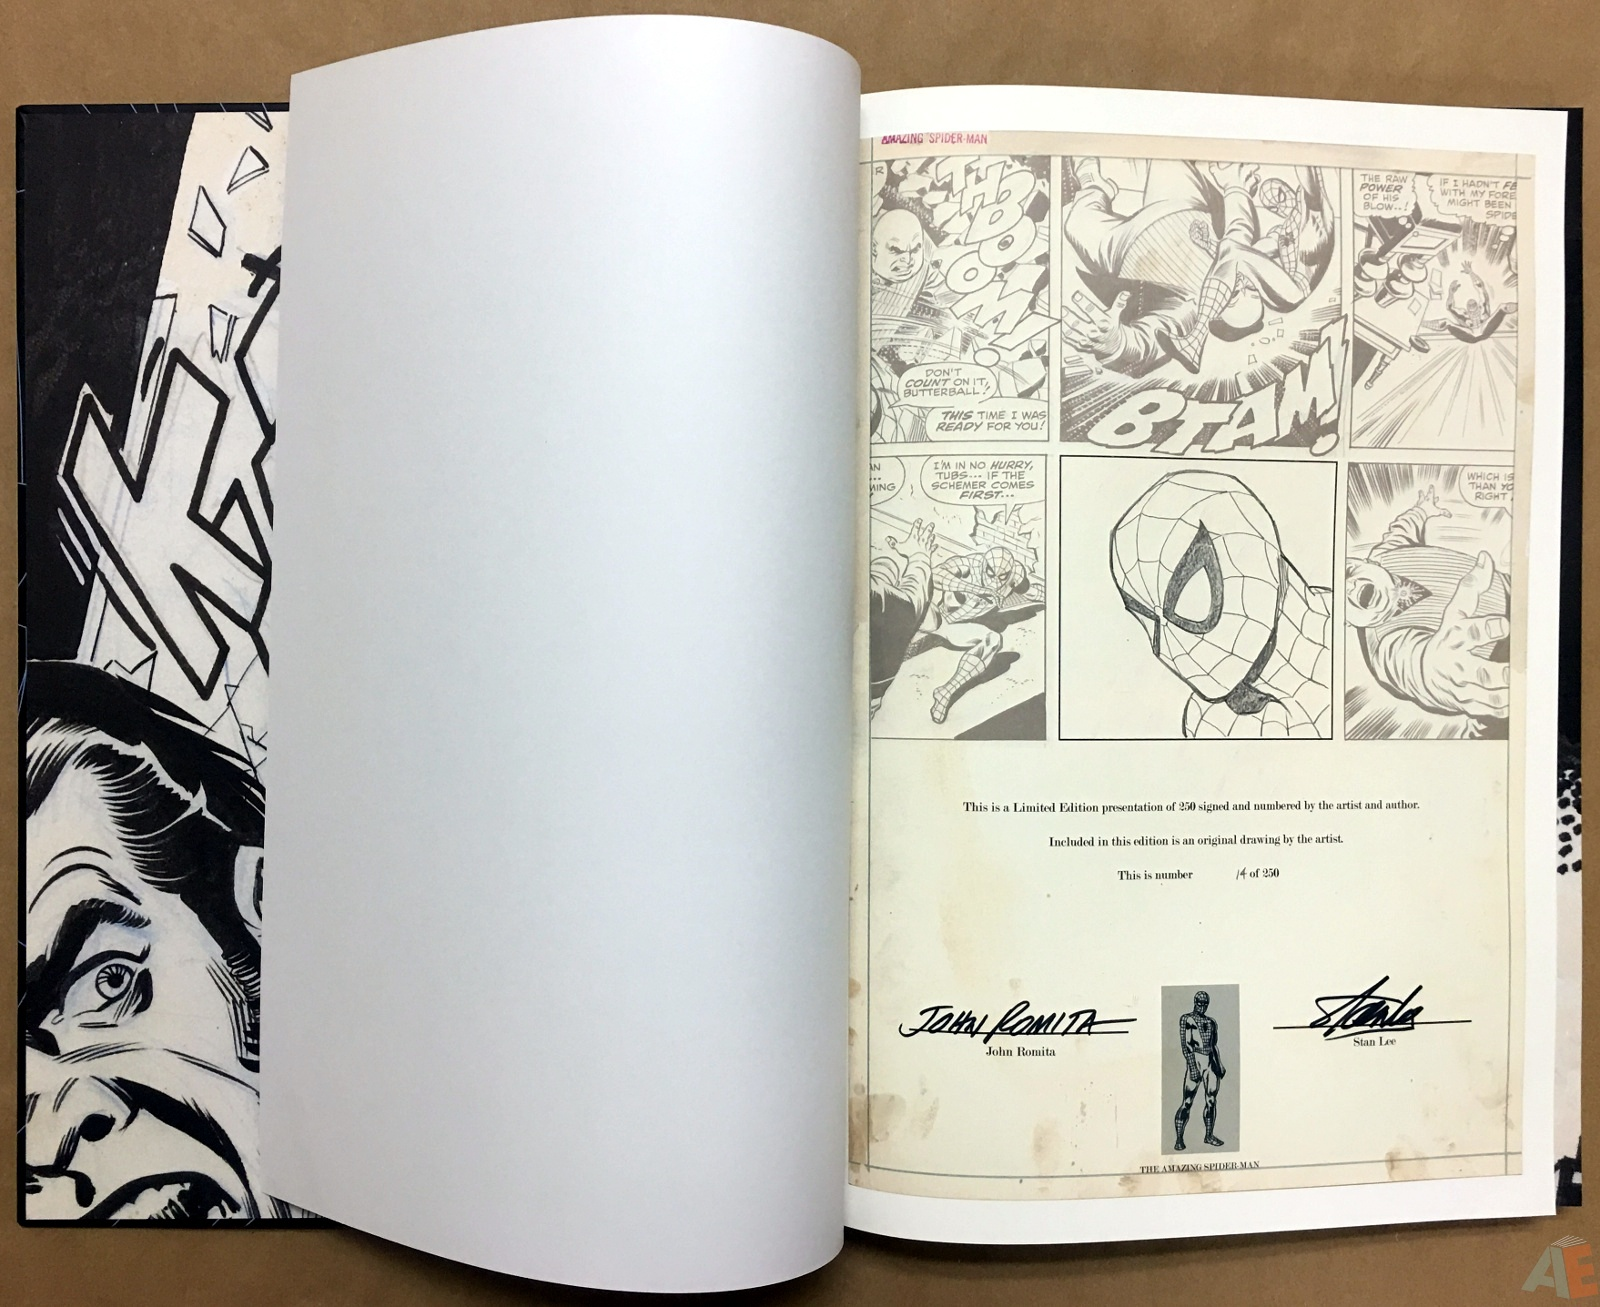 John Romita's The Amazing Spider-Man Artist's Edition 60